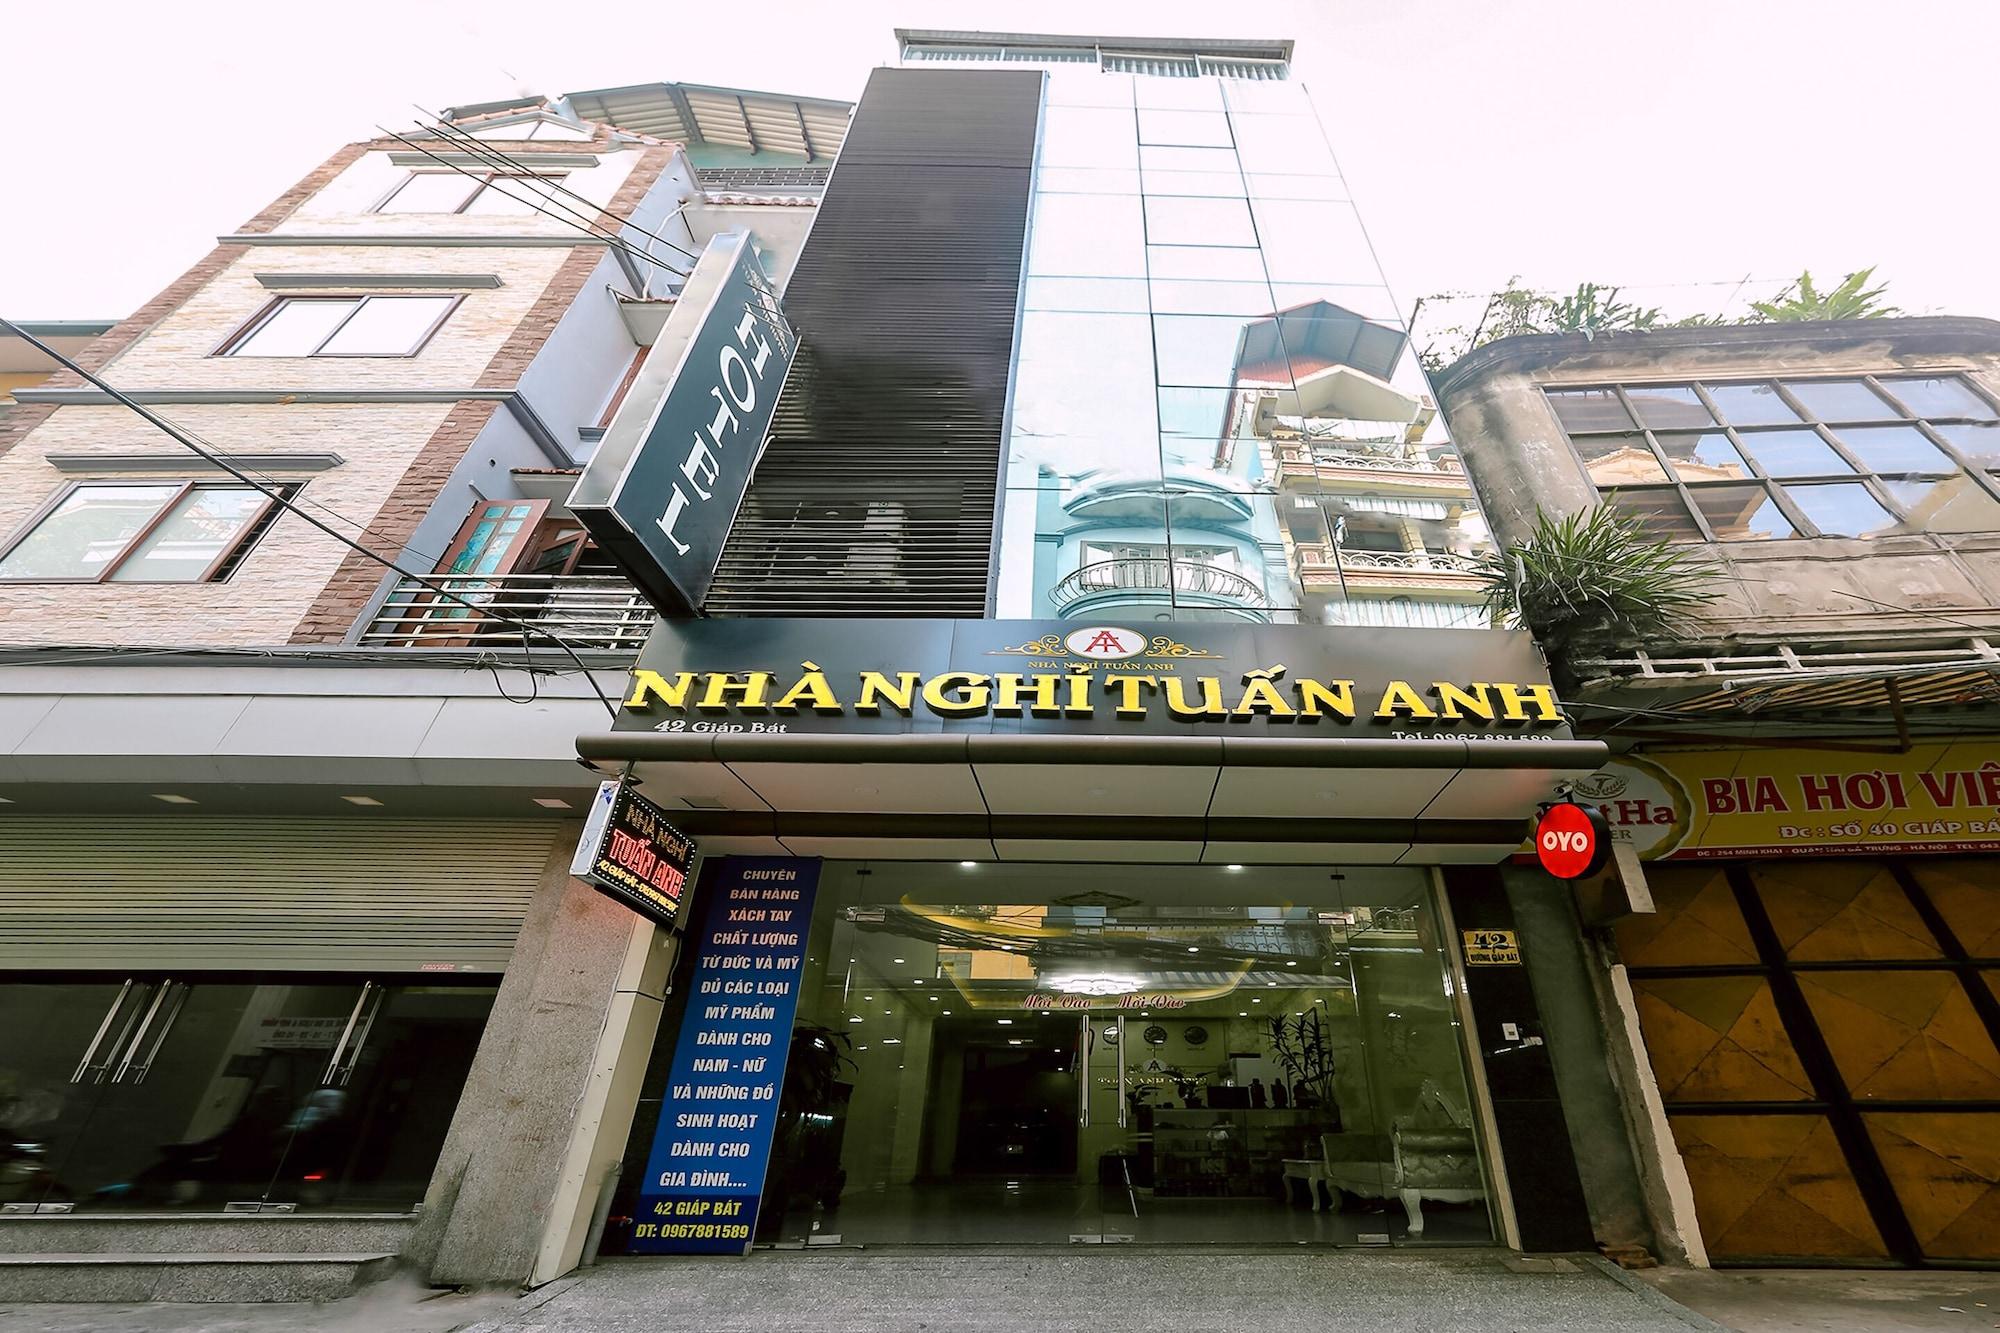 OYO 504 Tuan Anh Hotel, Hoàng Mai